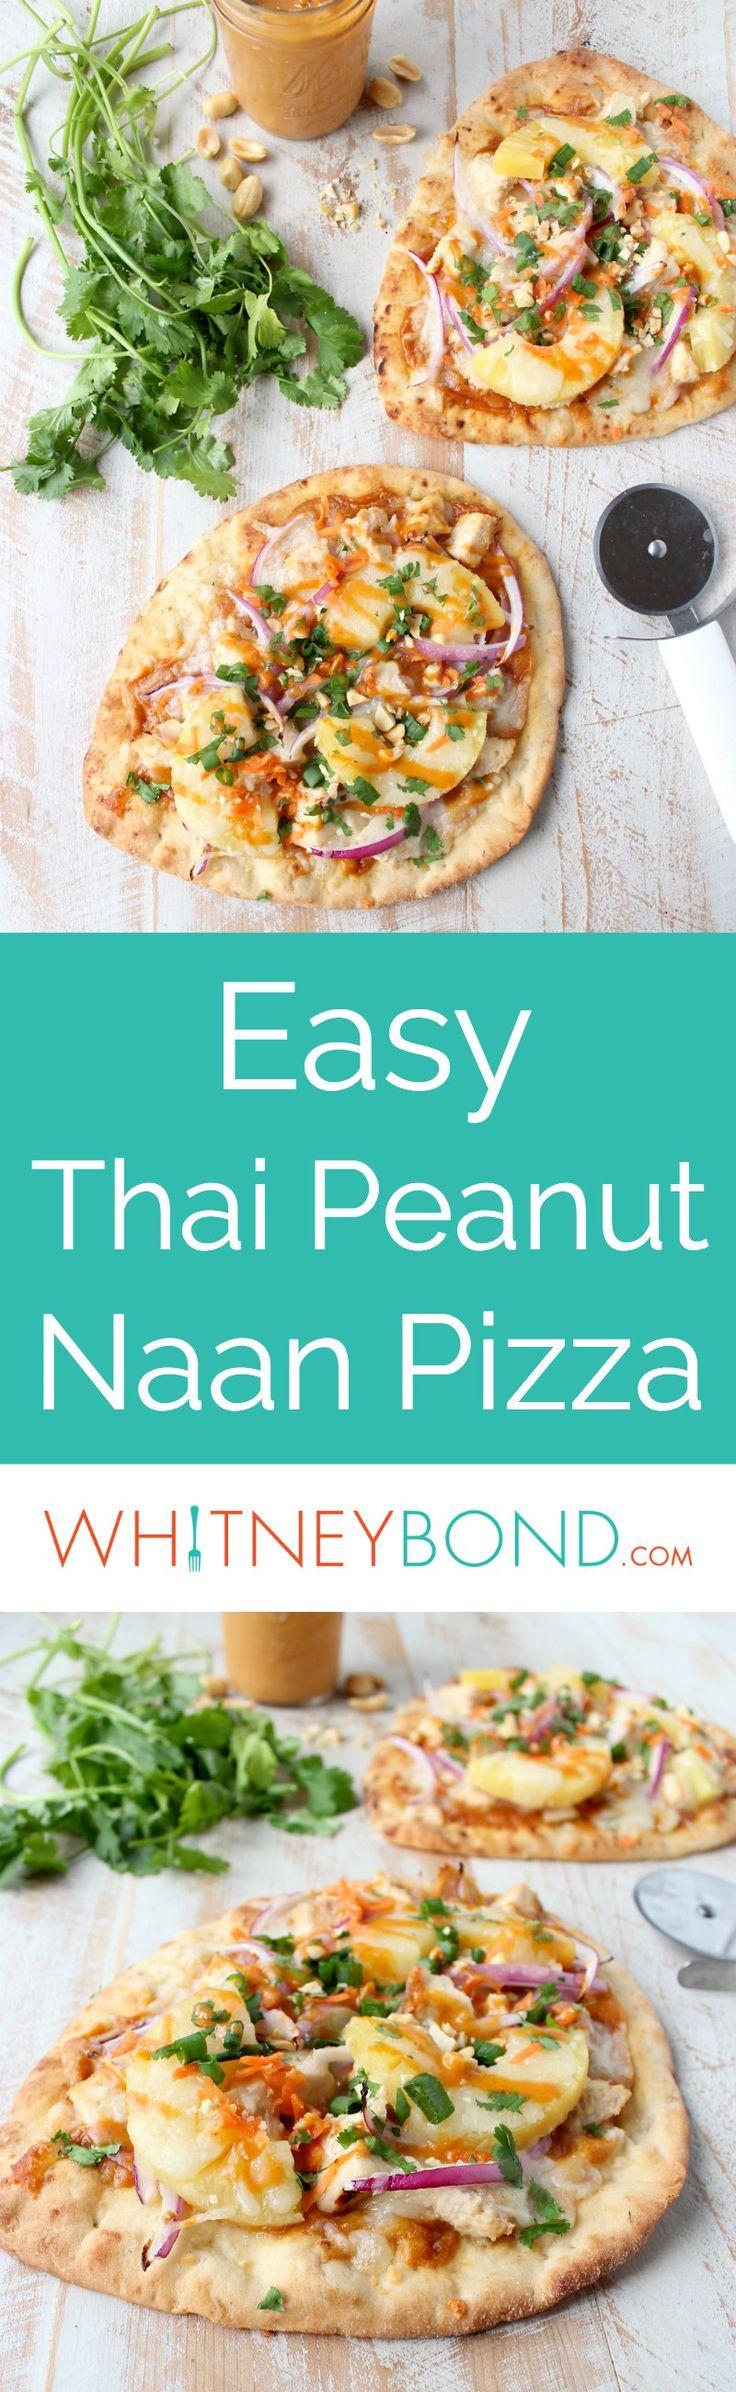 14 best Naan Pizza Flavor Combinations images on Pinterest ...